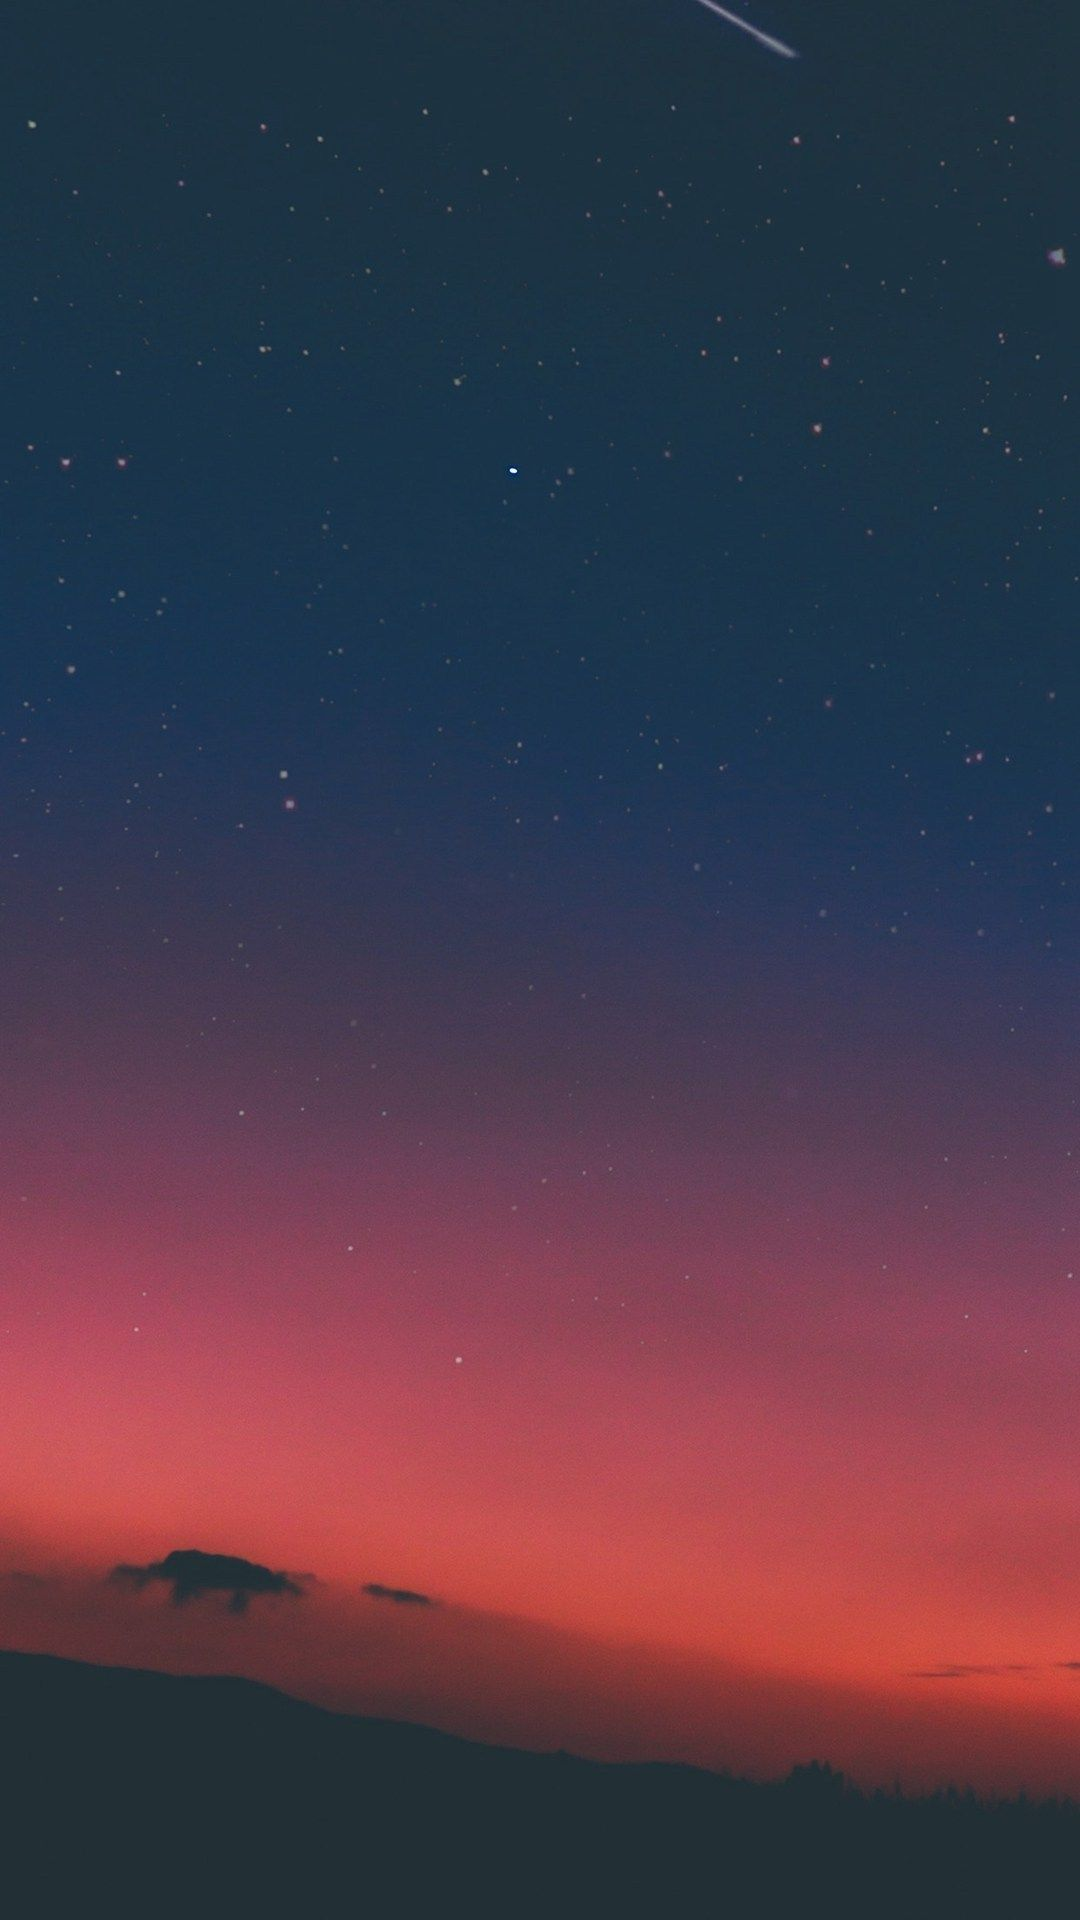 Best Ever iPhone 7 plus wallpaper hd